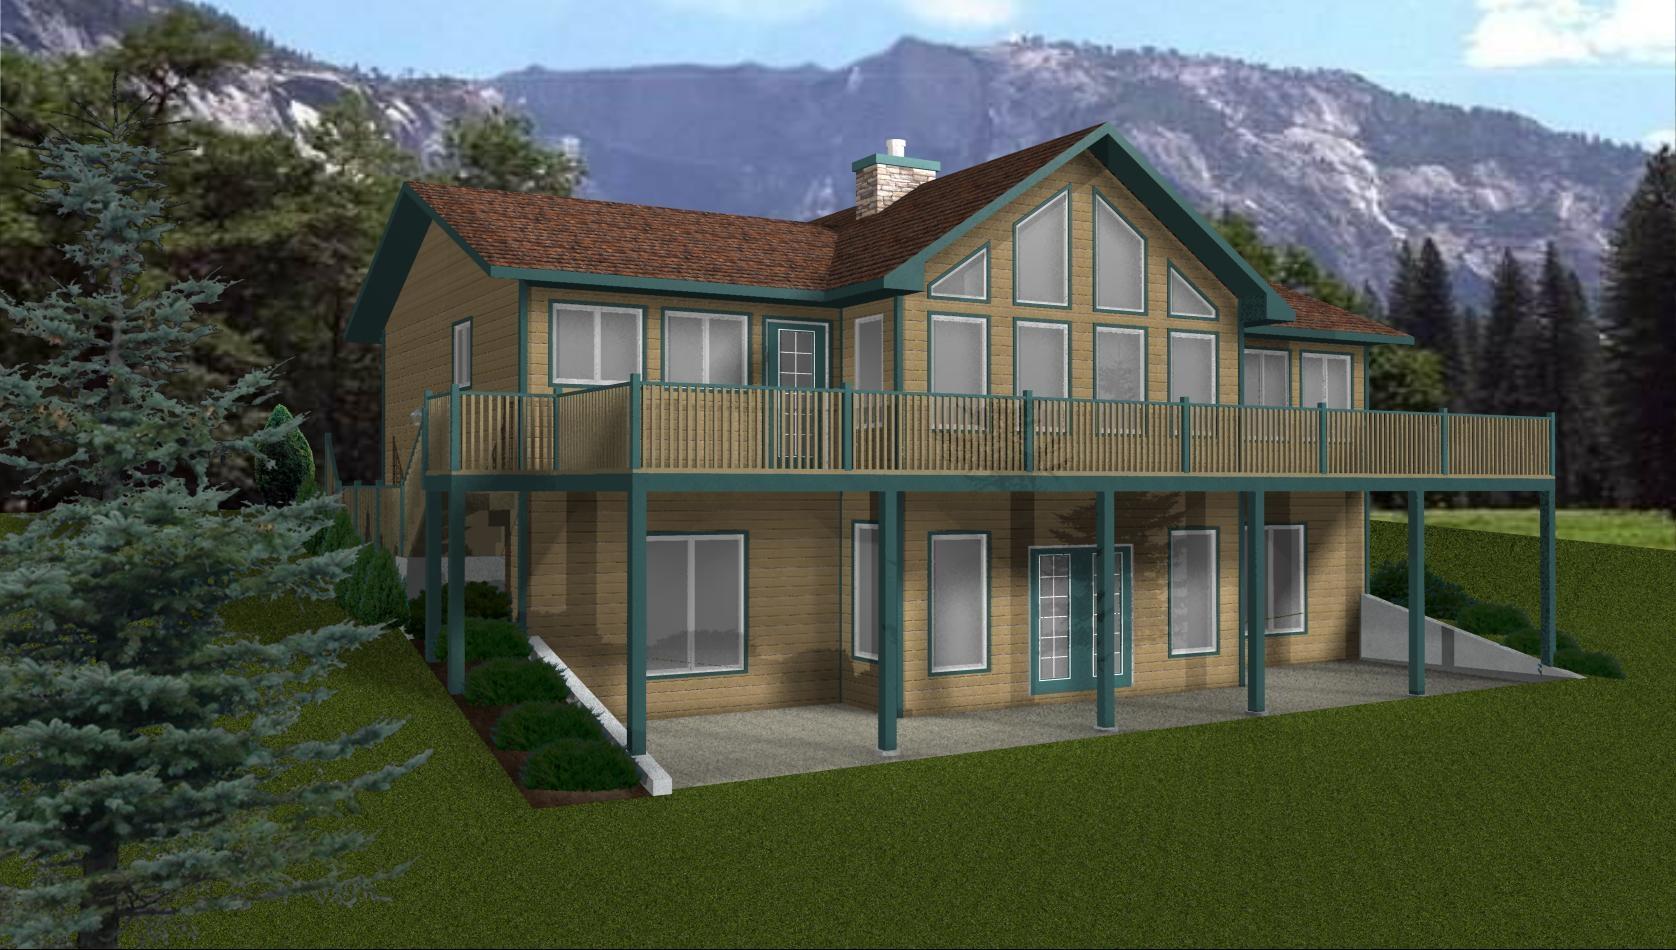 Walkout Basement House Plans Small